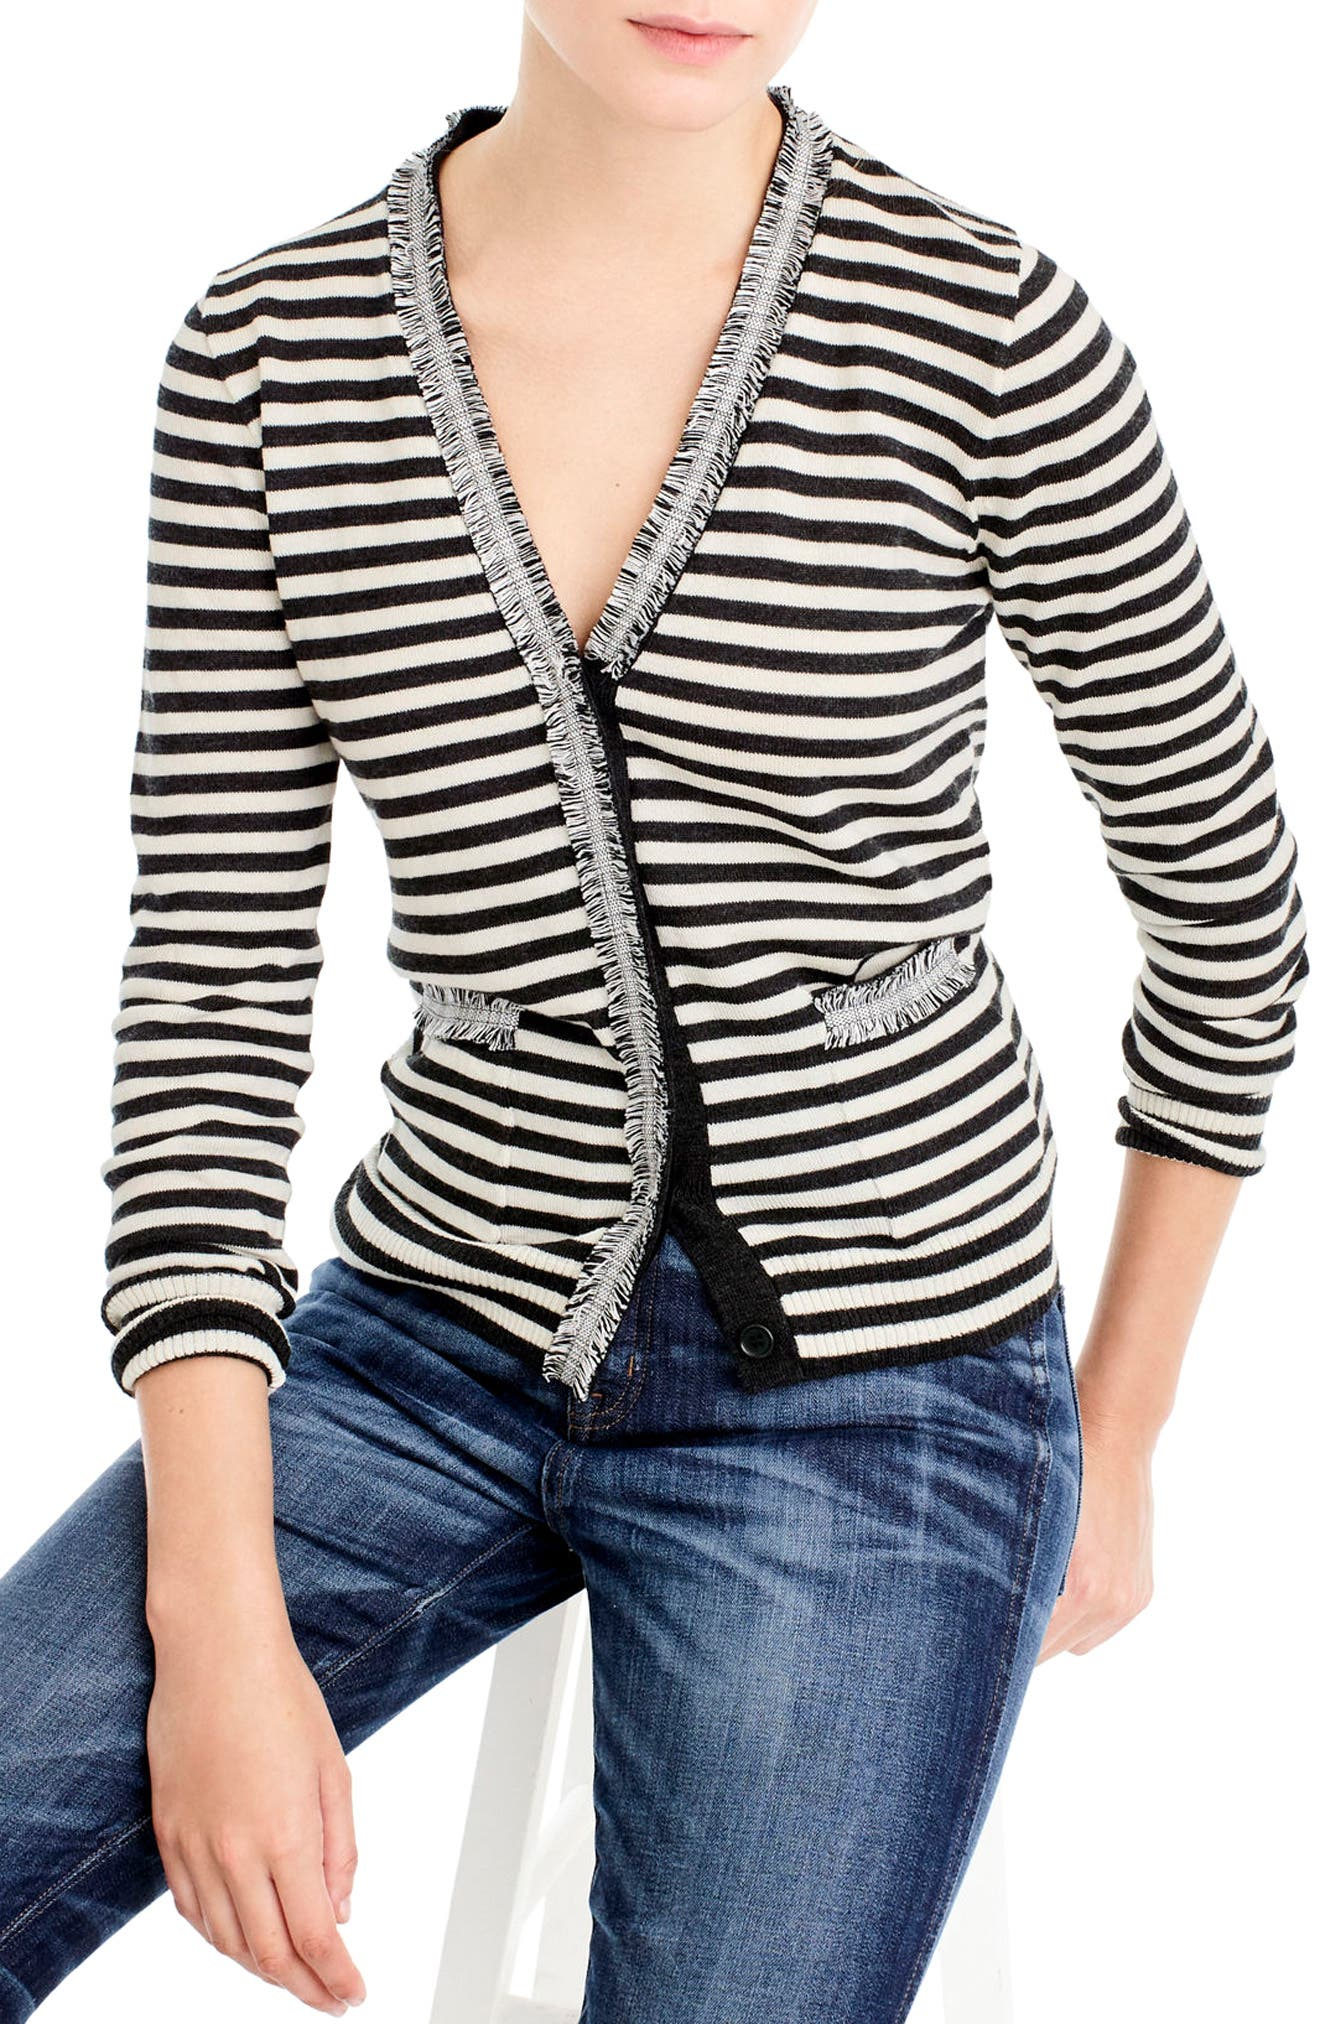 Alternate Image 1 Selected - J.Crew Stripe Harlow Cardigan Sweater